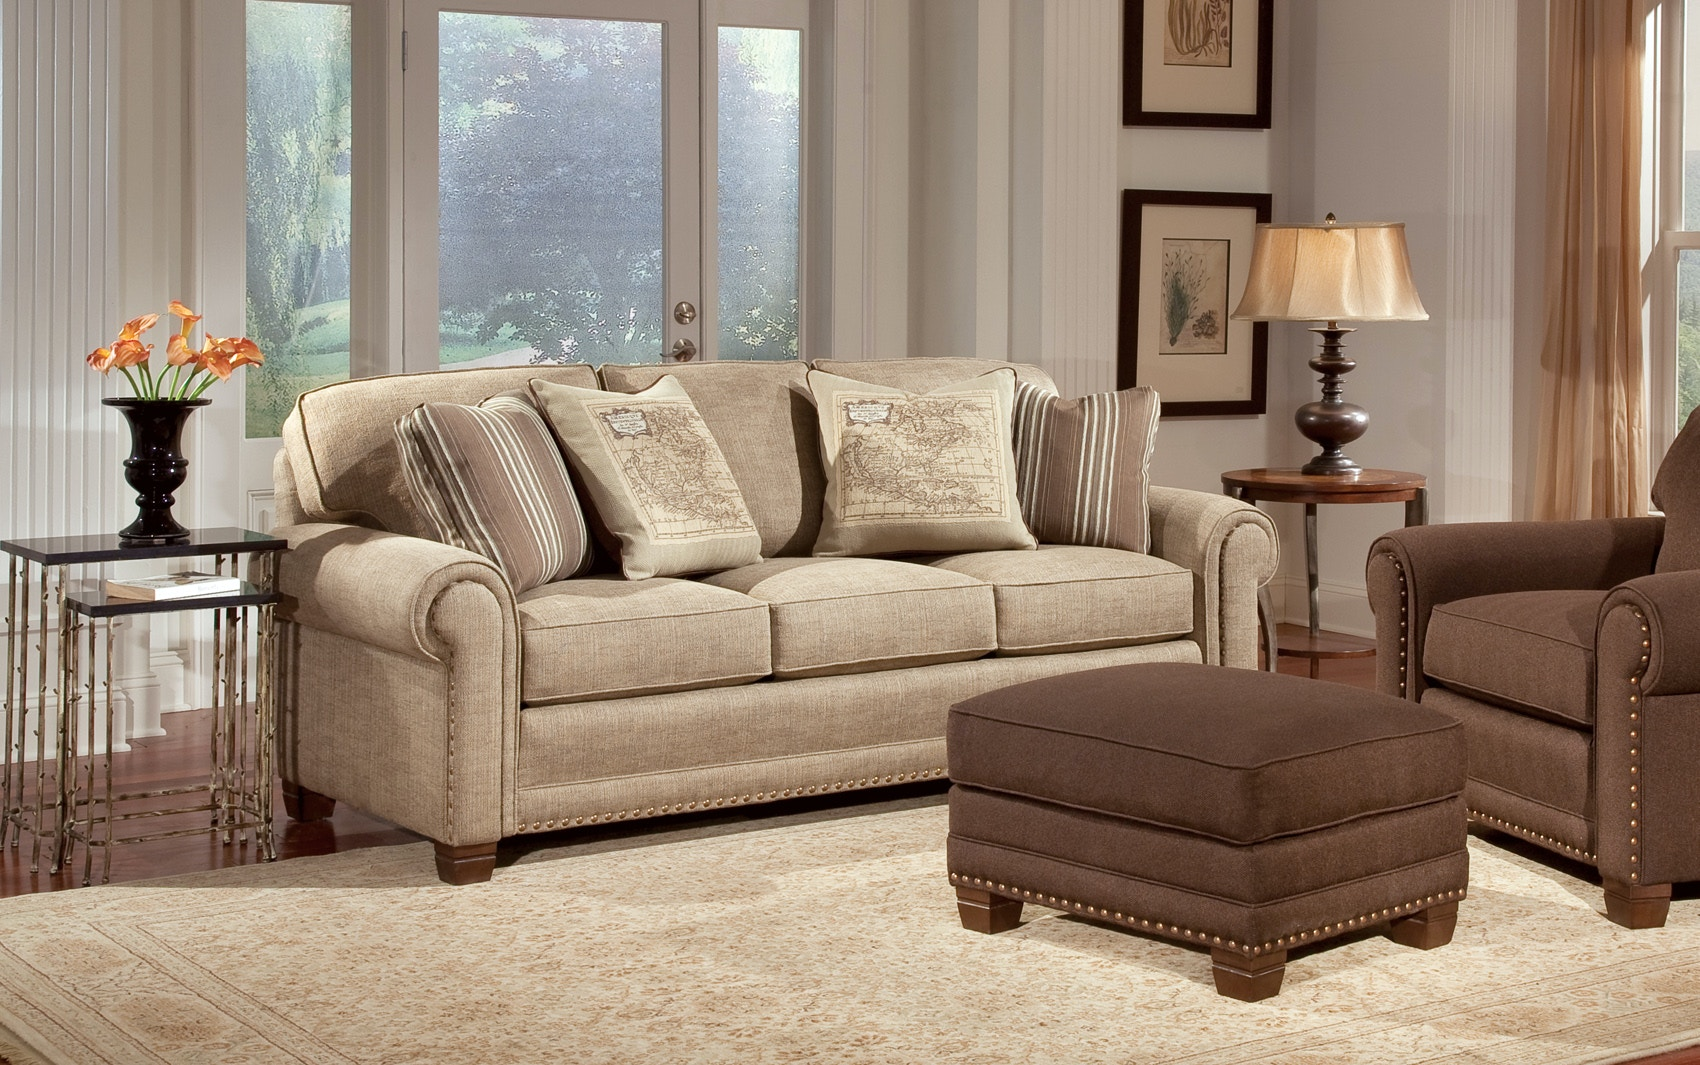 Smith Brothers Living Room Three Cushion Sofa 055903